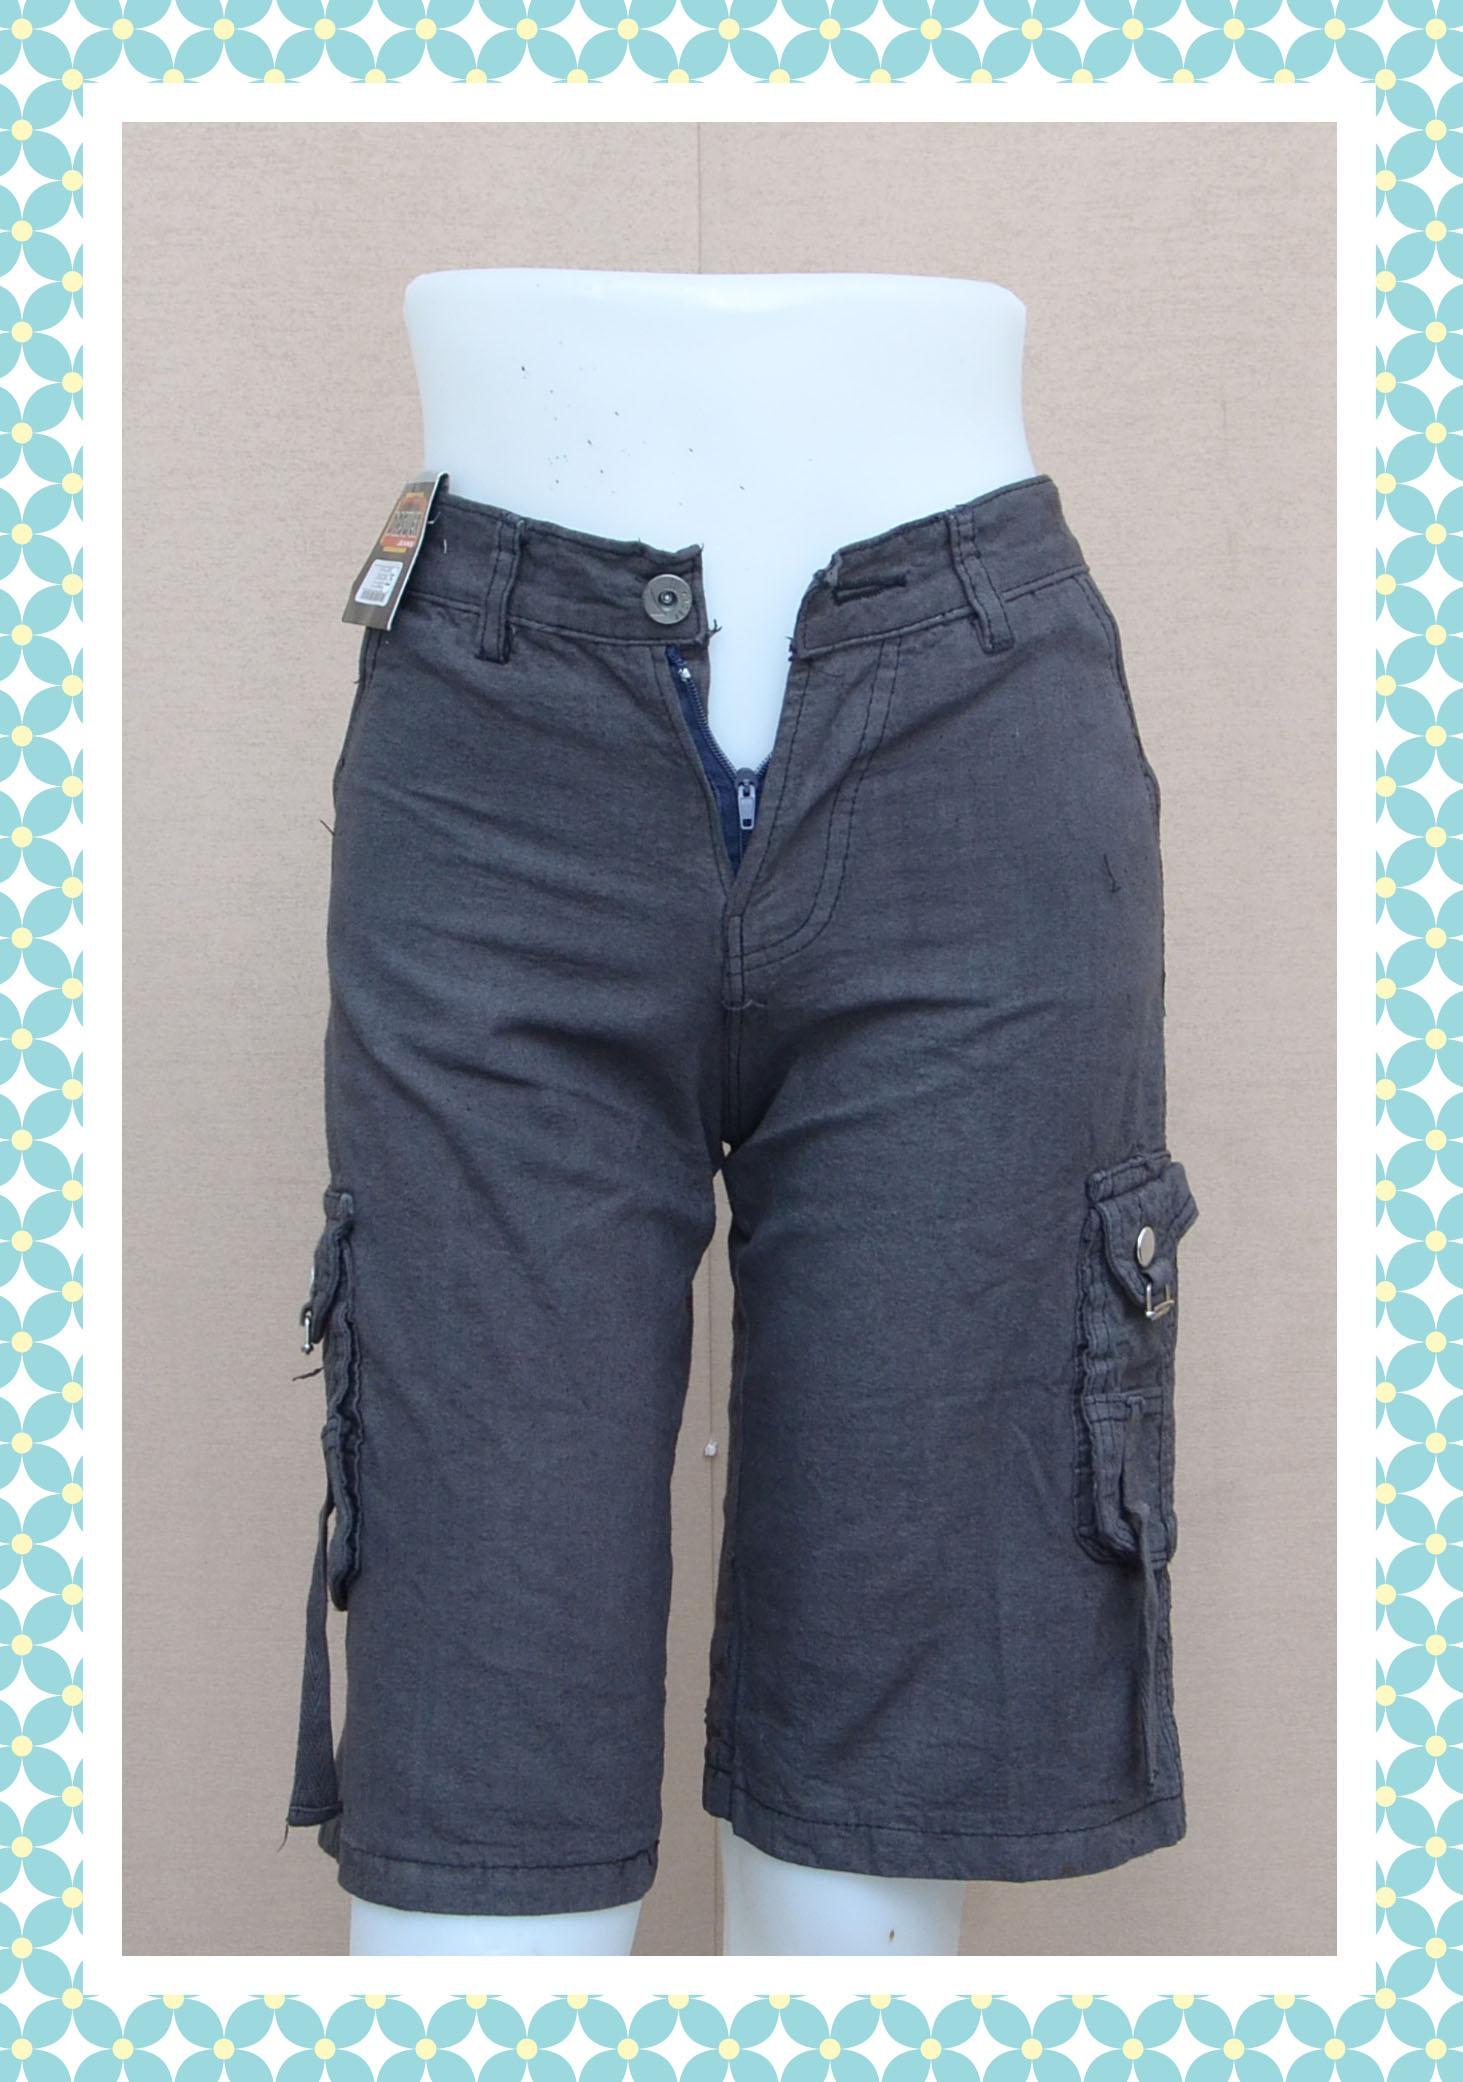 Celana jeans Jumbo anak murah